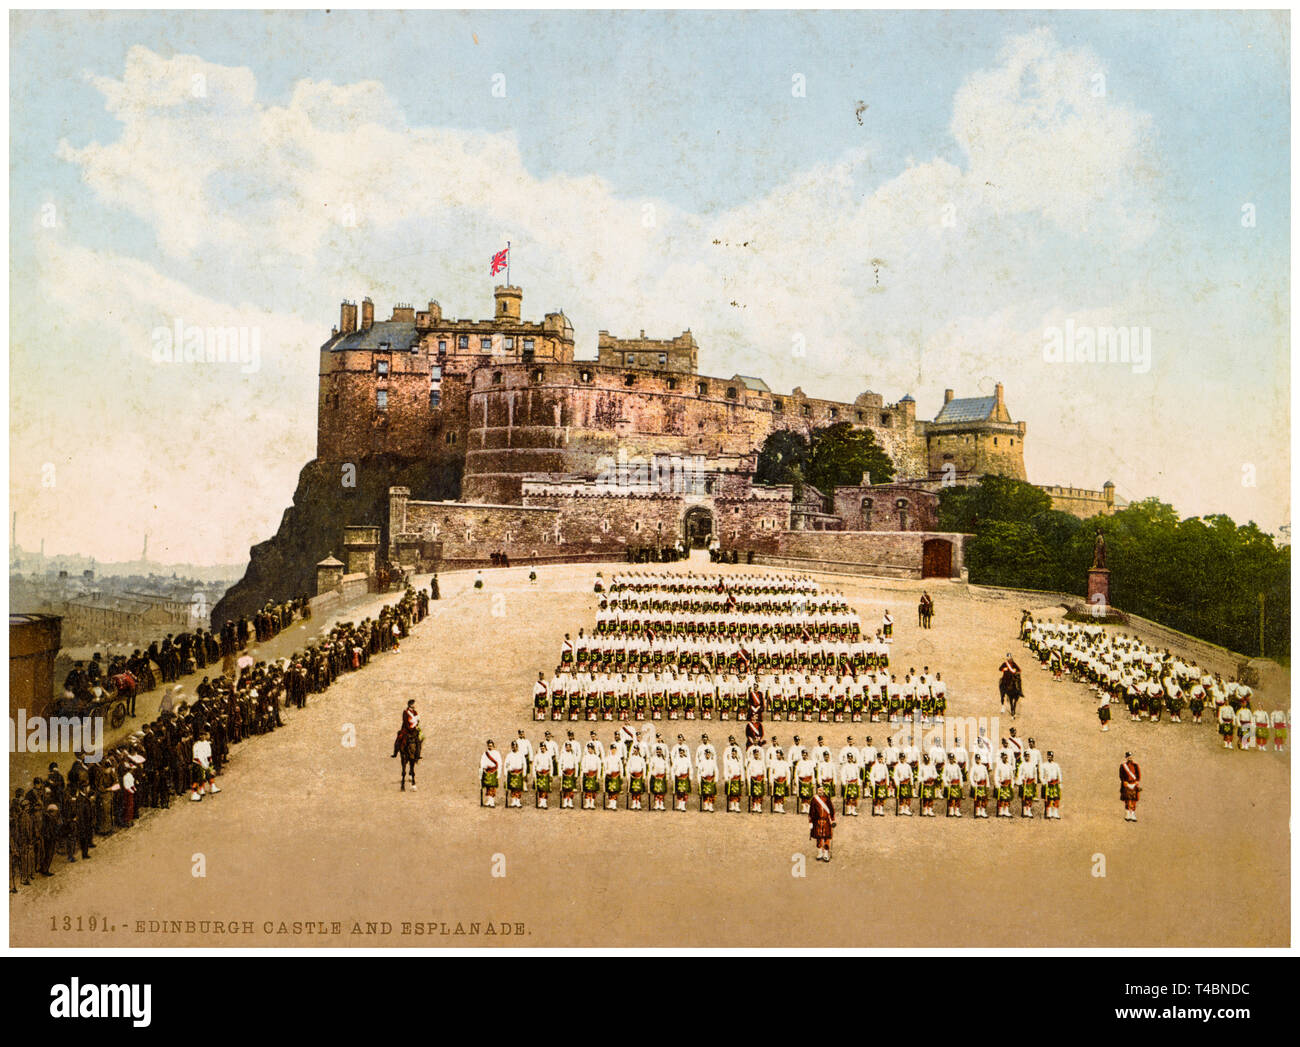 Edinburgh Castle and Esplanade, hand coloured vintage photograph, c. 1890-1906 Stock Photo